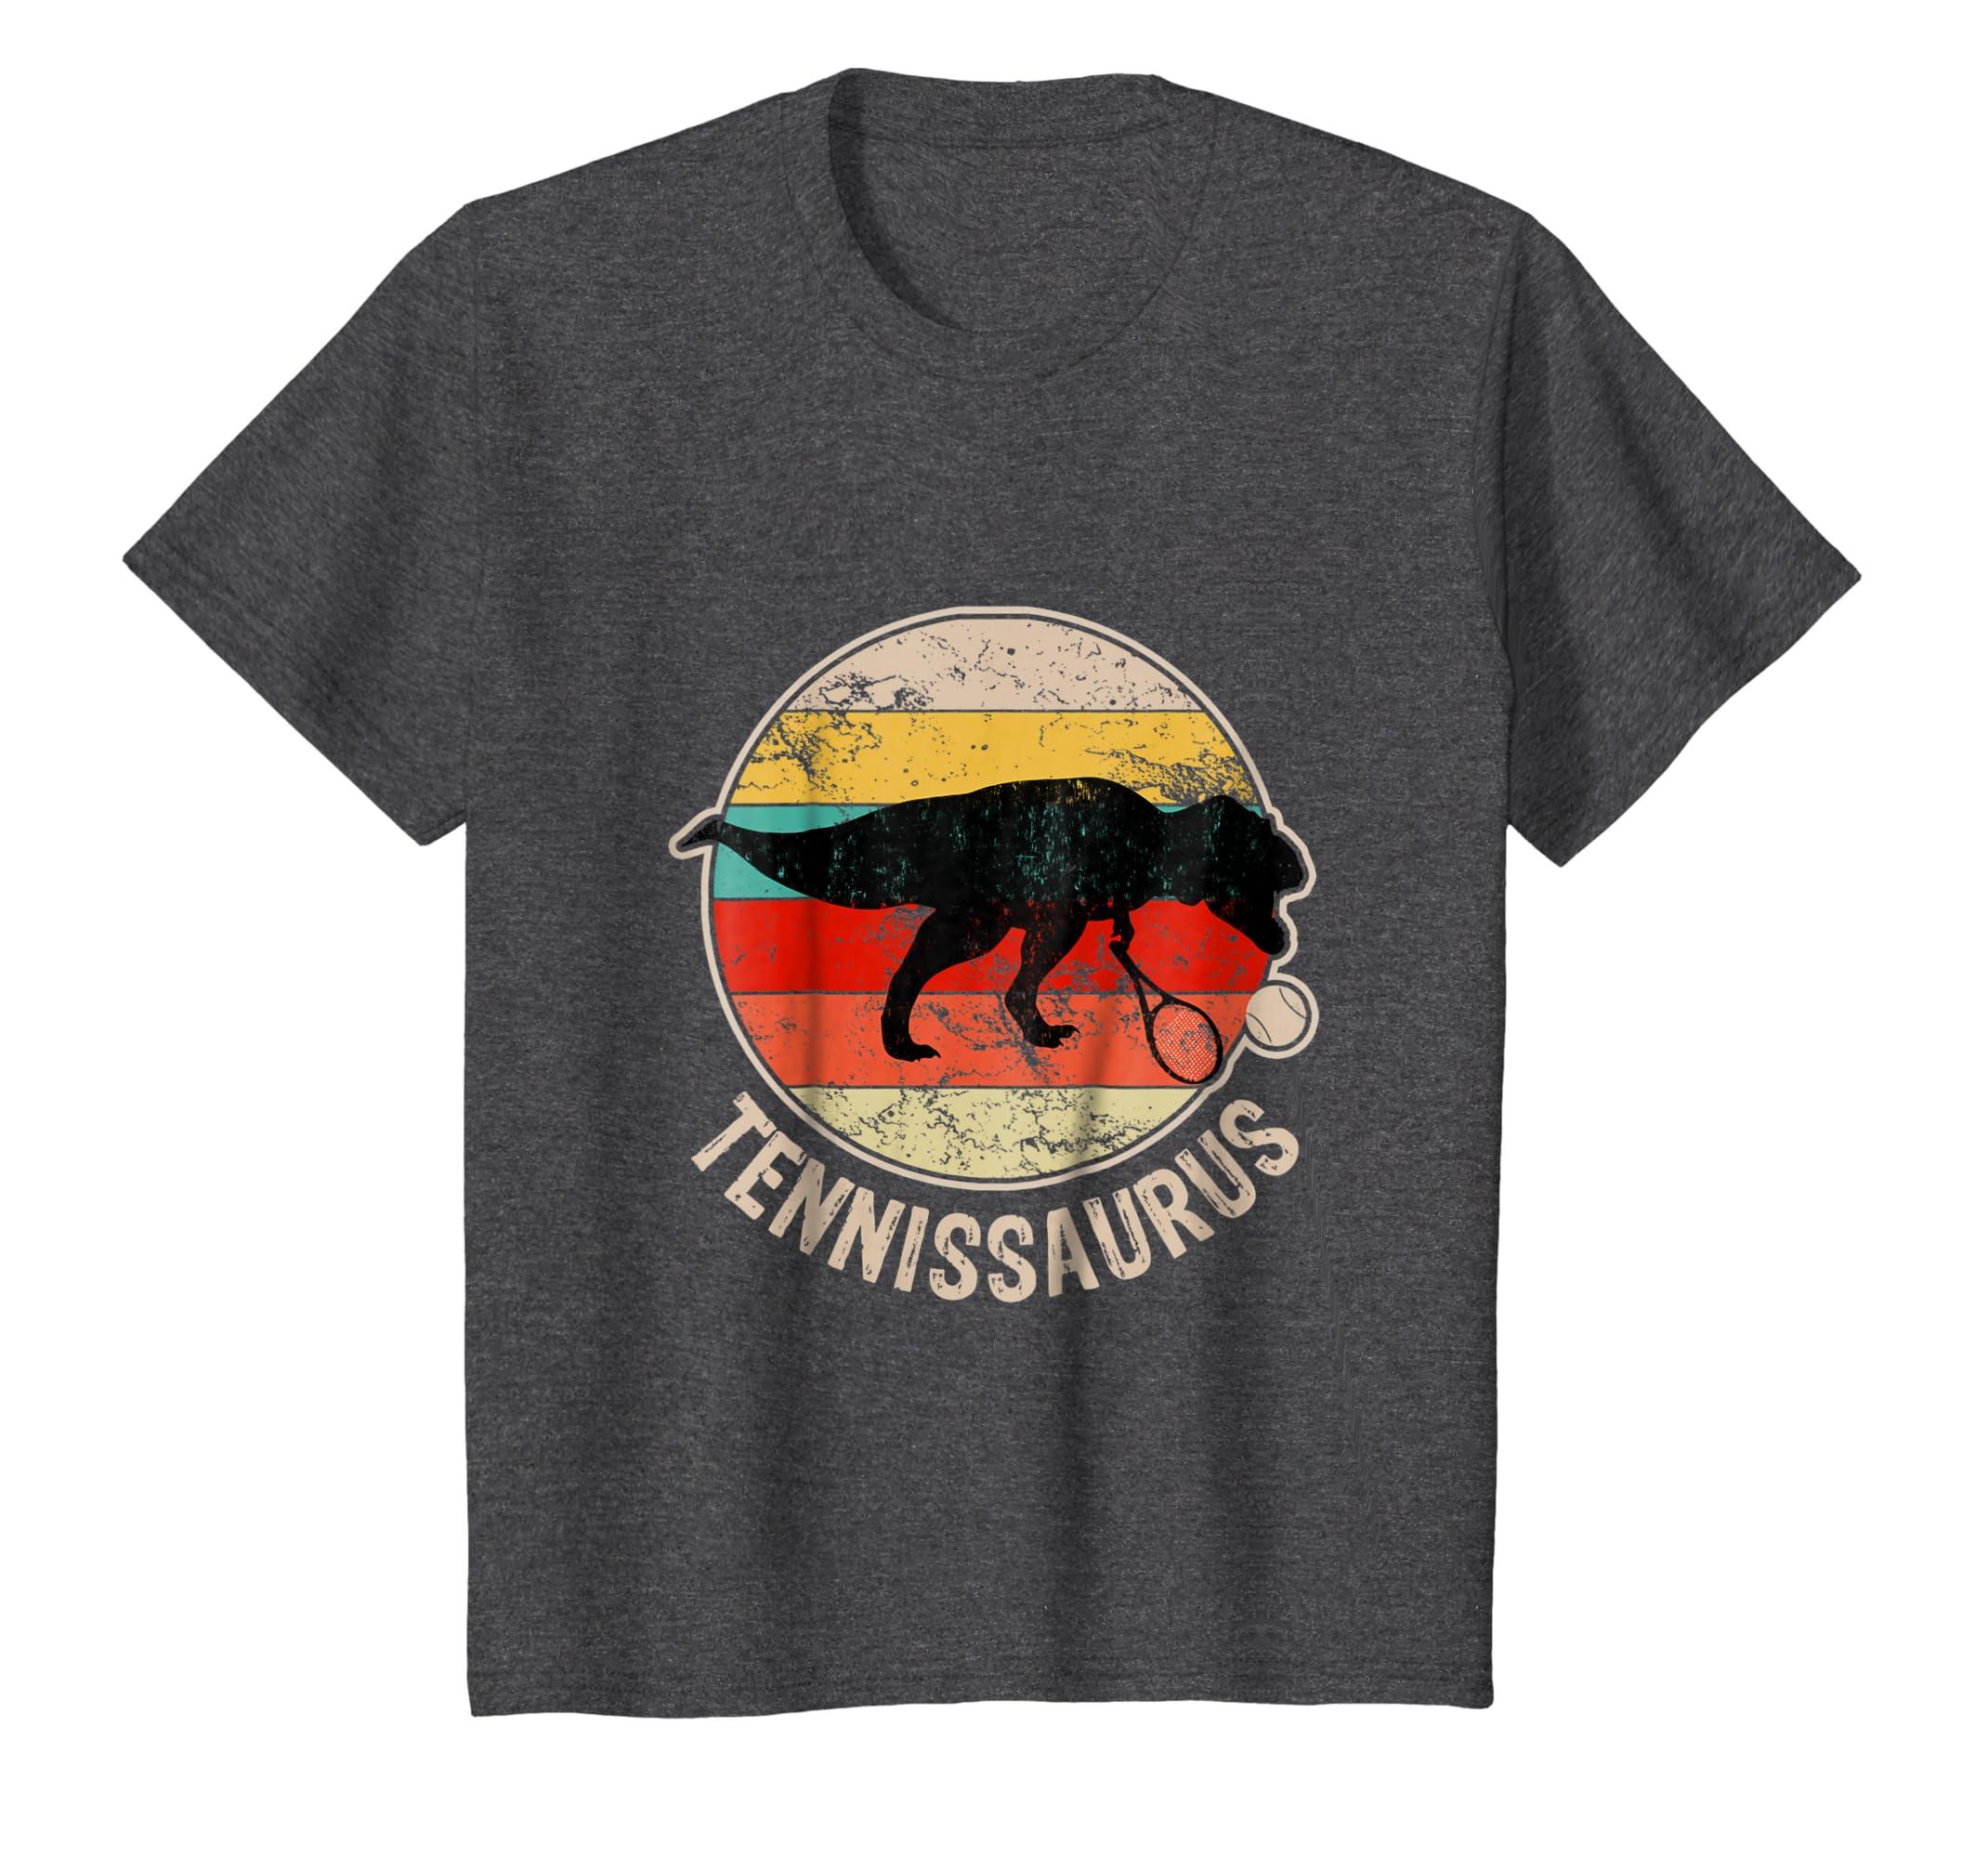 Amazon.com  Tennissaurus Funny Tennis Coach T-Rex Dinosaur T-Shirt  Clothing 32c934064386